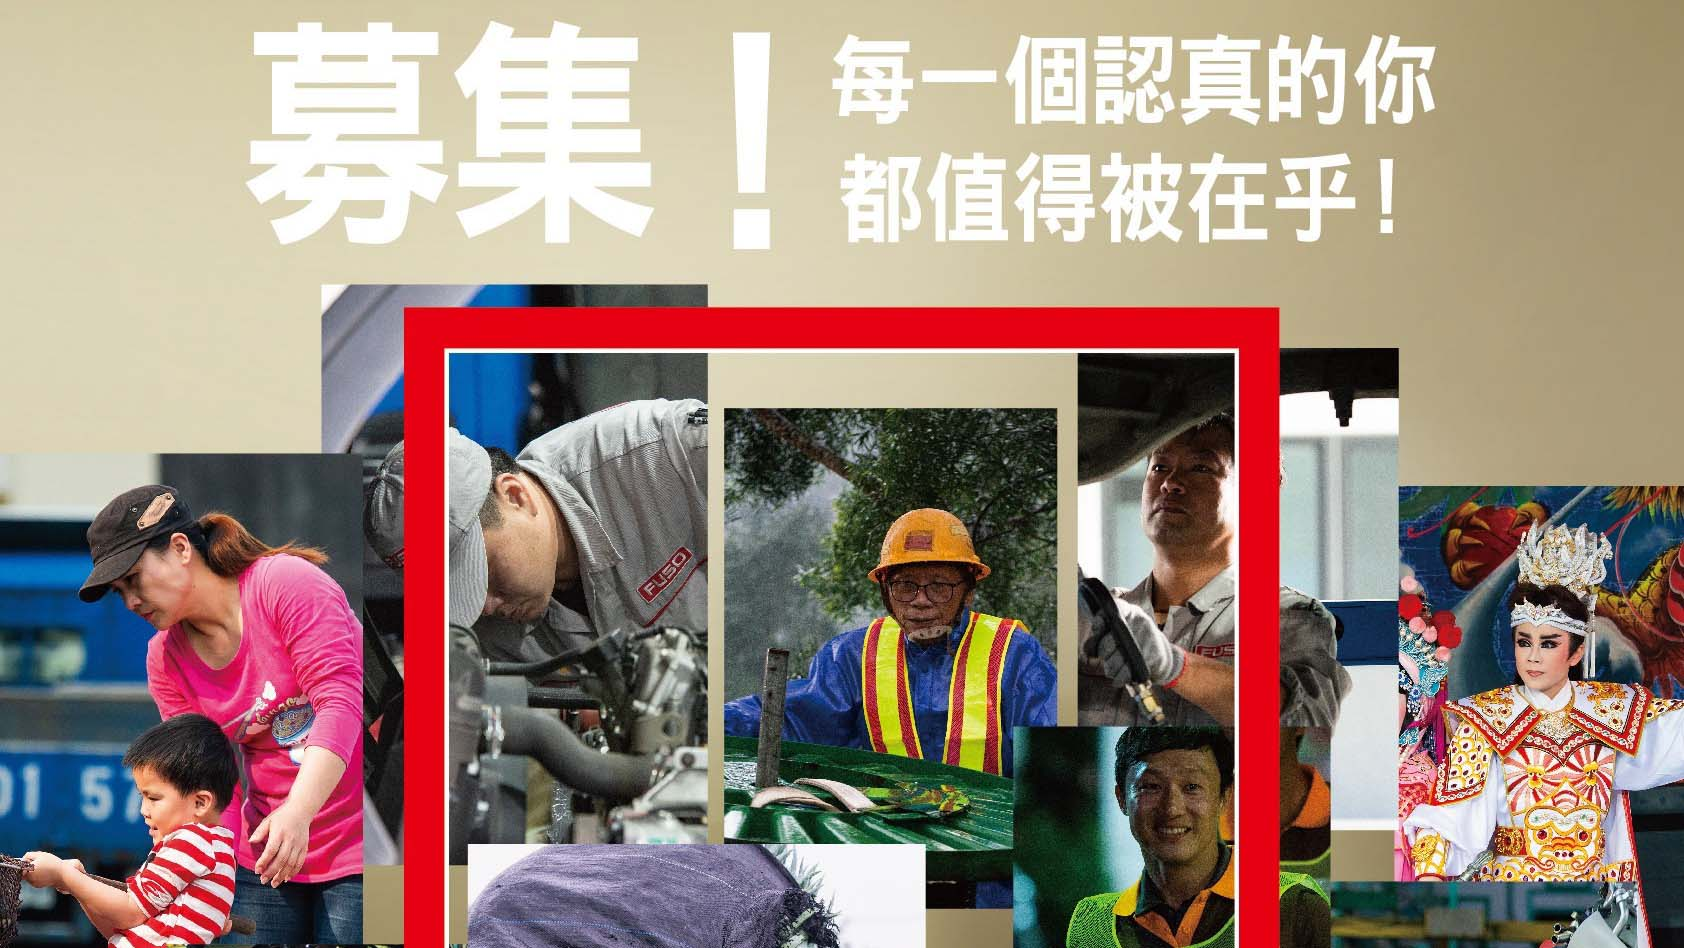 Fuso Hero 風雲英雄榜全民共選活動 7/1 開跑!